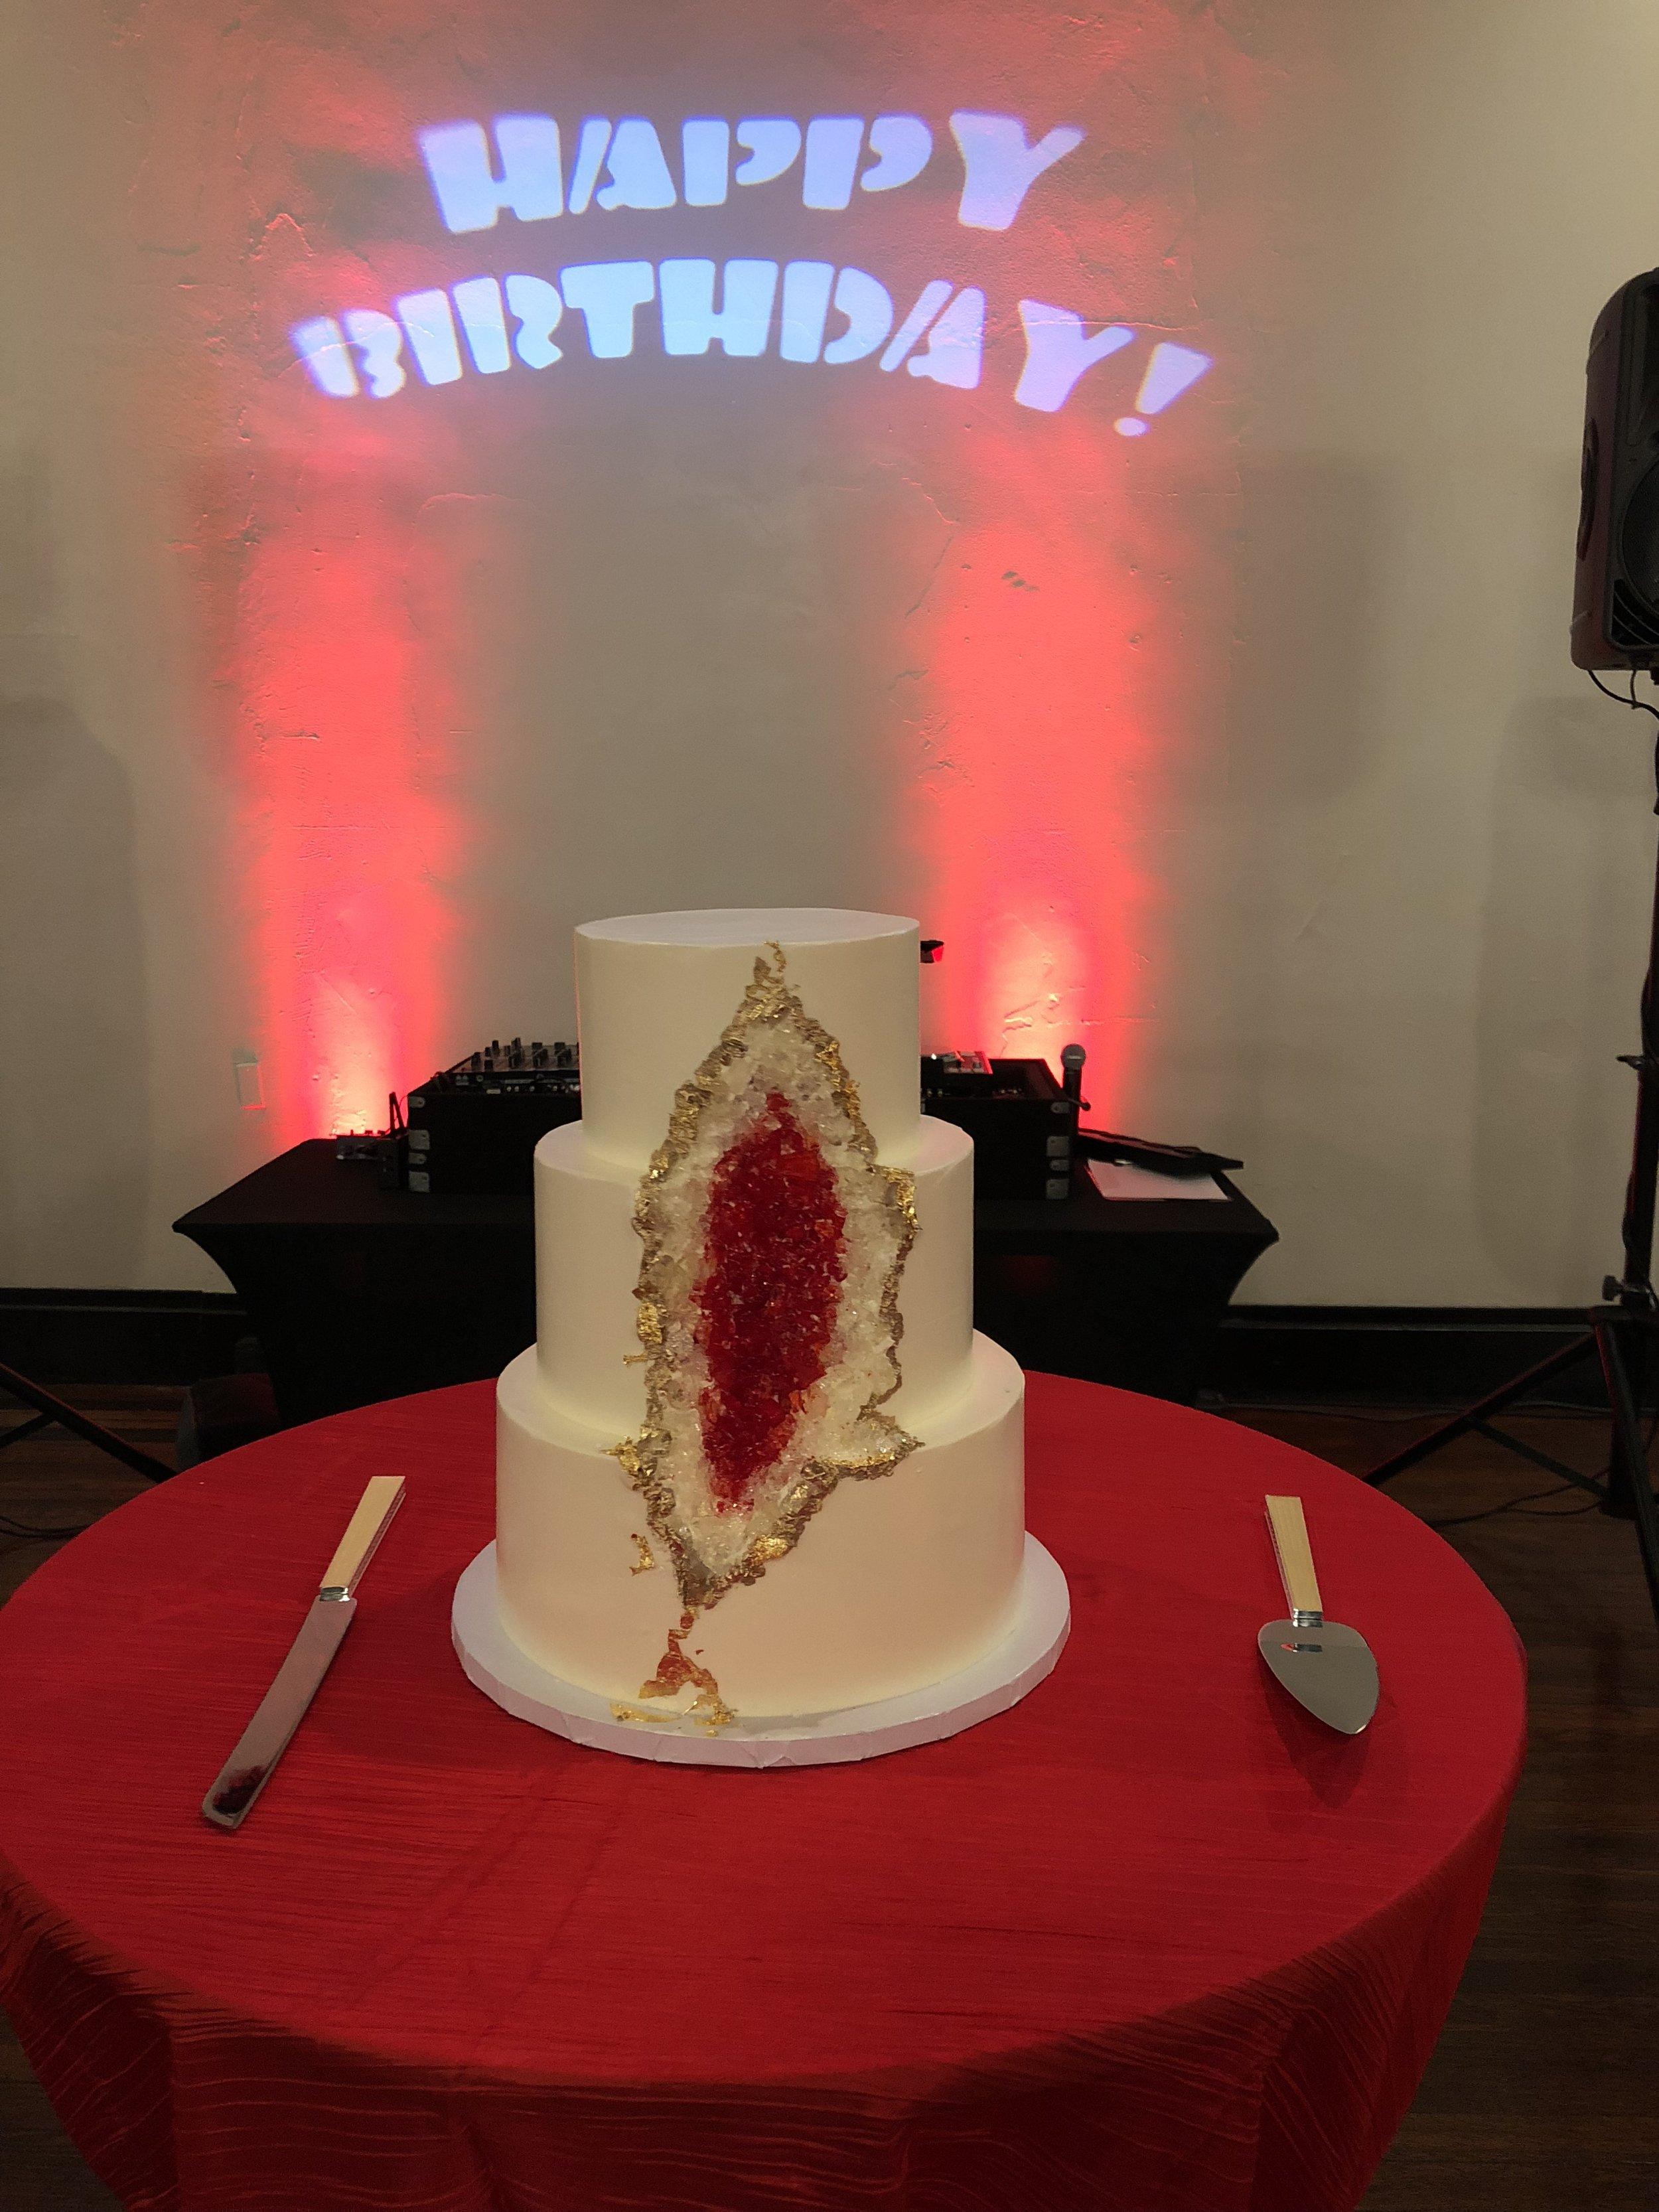 We host Birthdays, too!